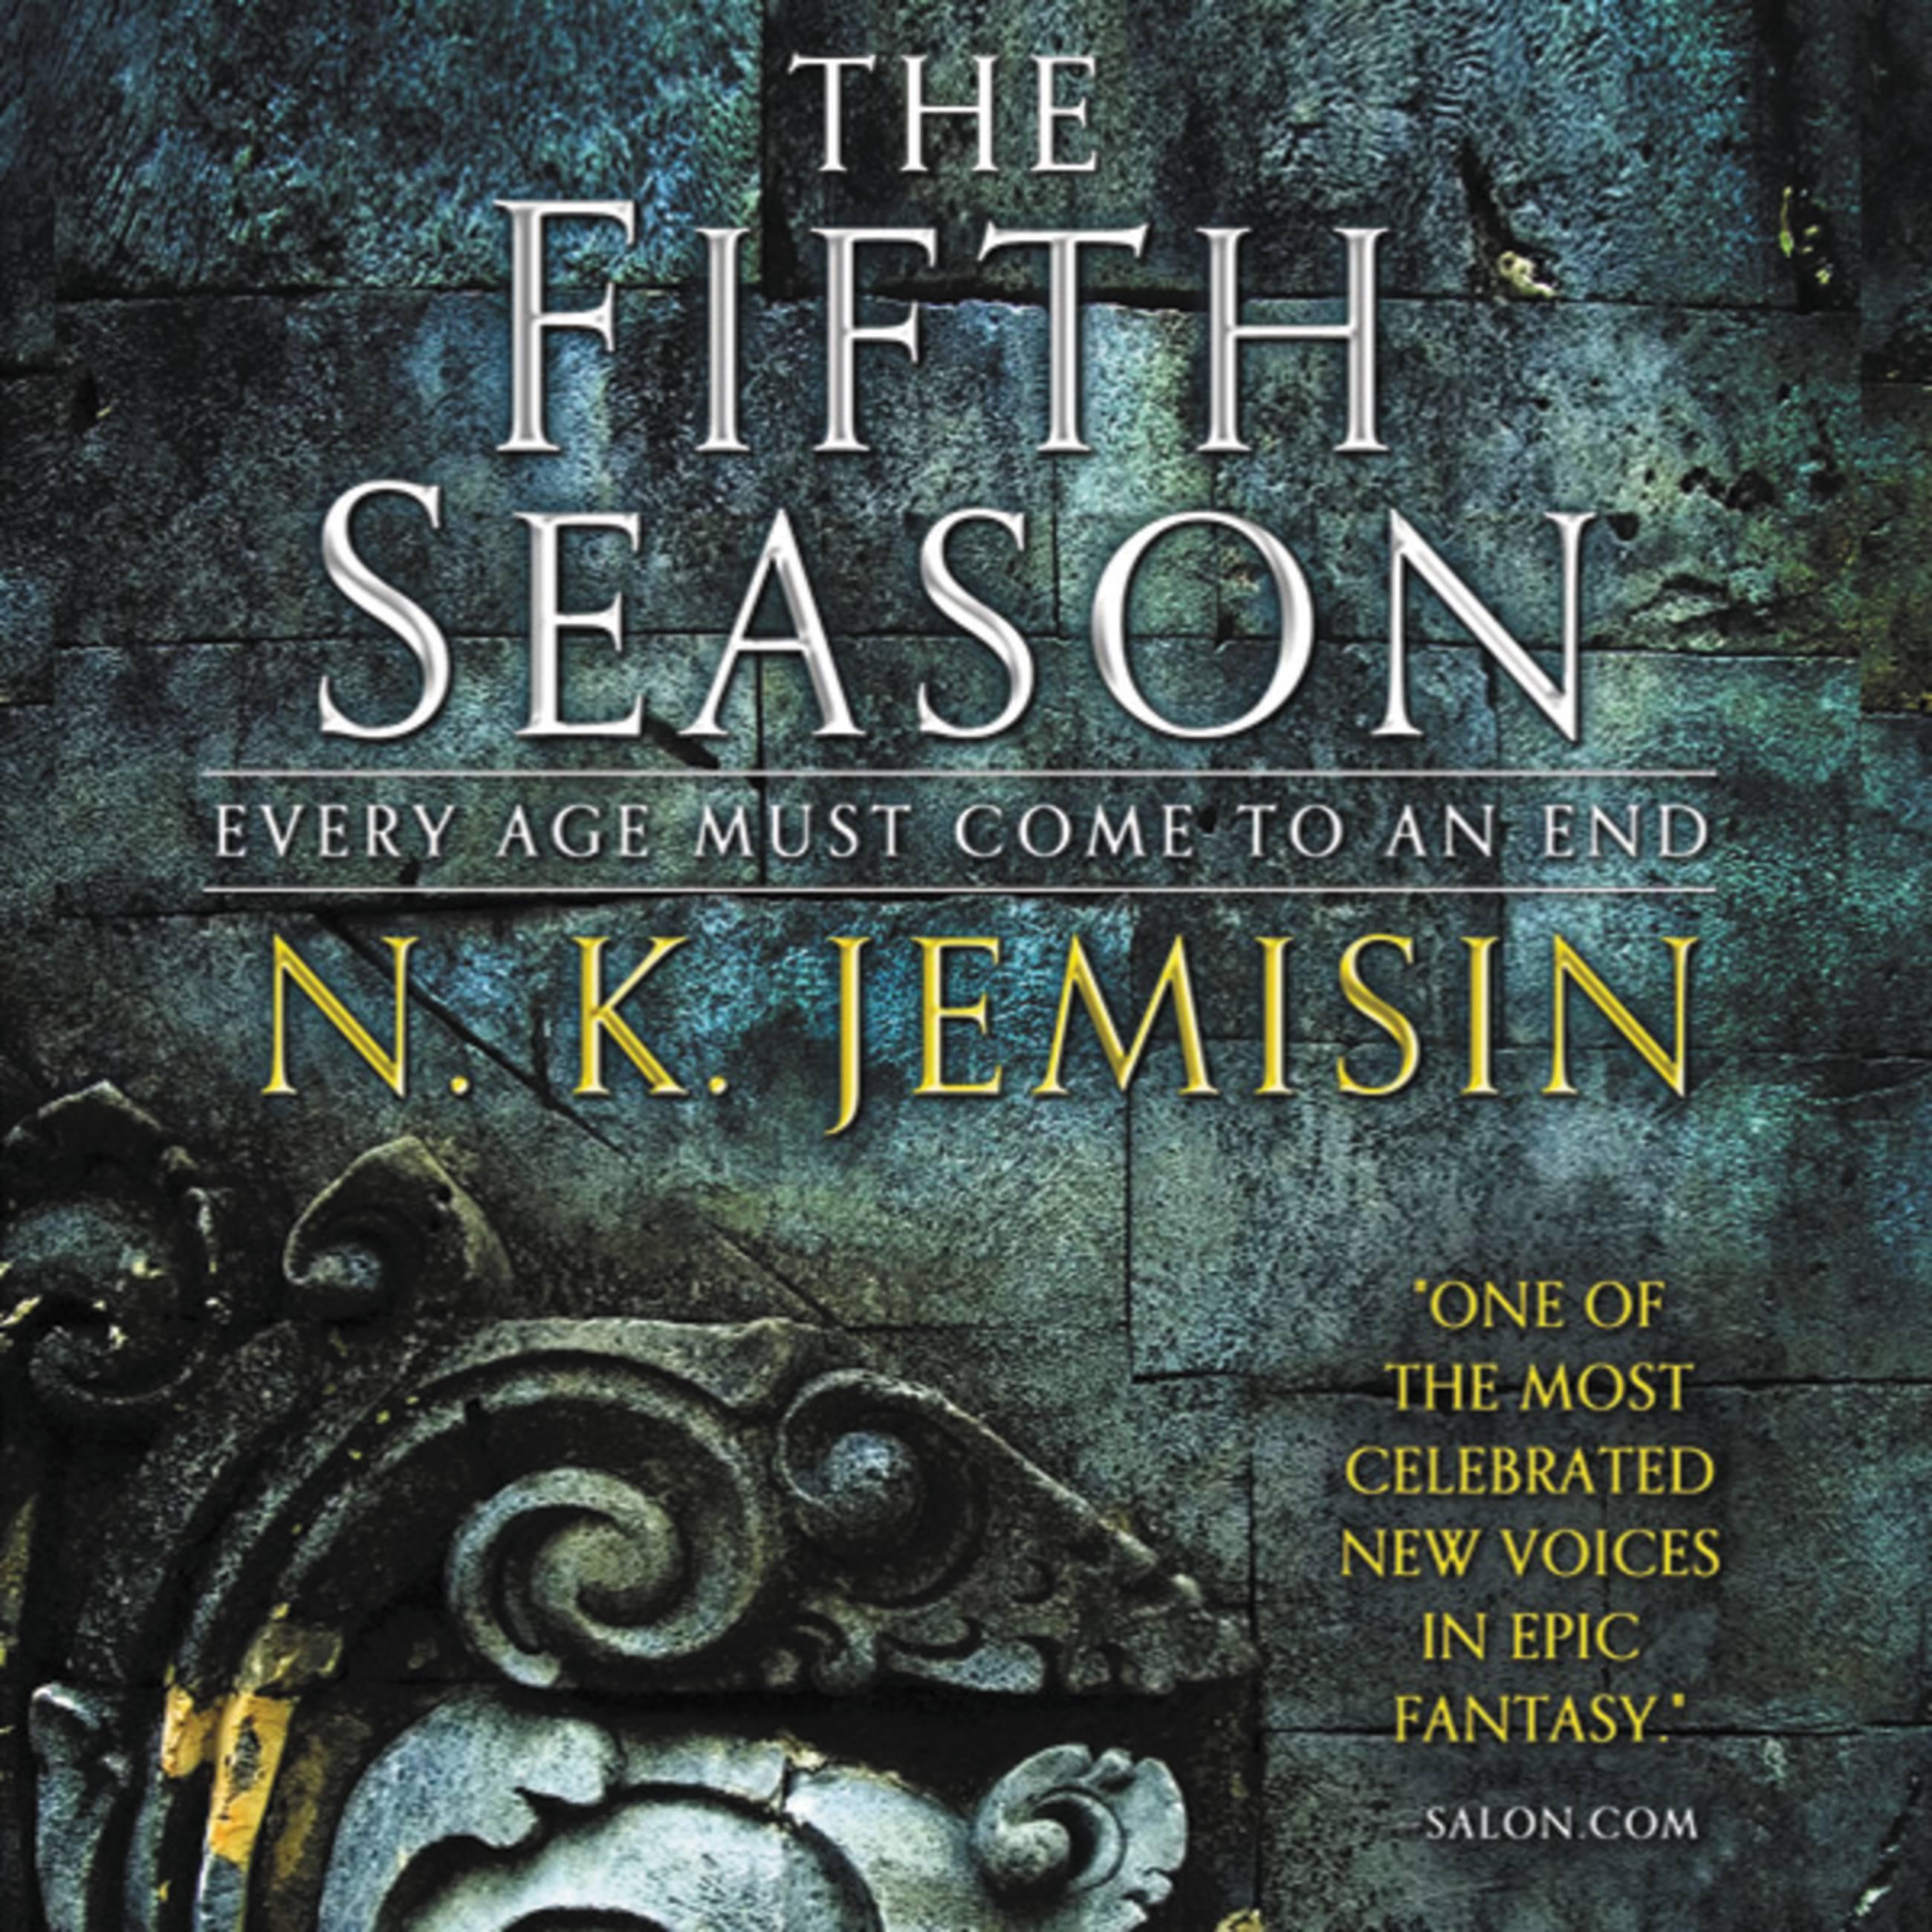 The Fifth Season by N. K. Jemisin | Hachette Book Group